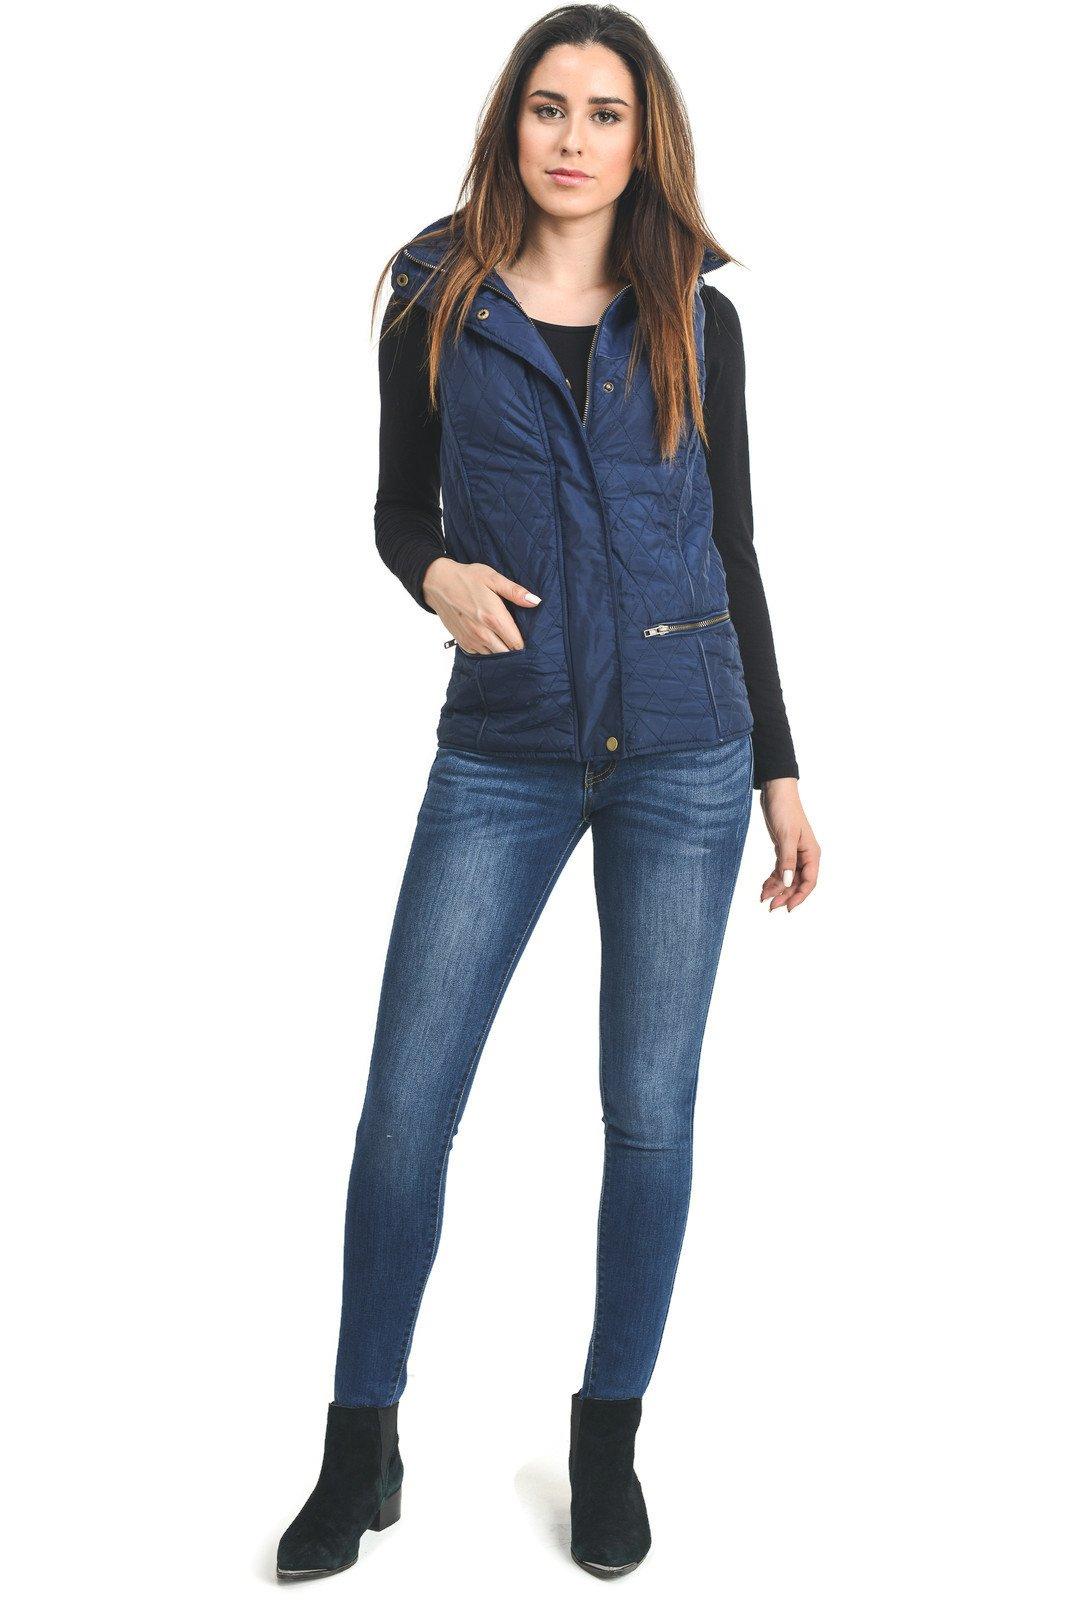 Instar Mode Womens Lightweight Quilted Zip Jacket/Vest (WV22113 Navy, Medium)